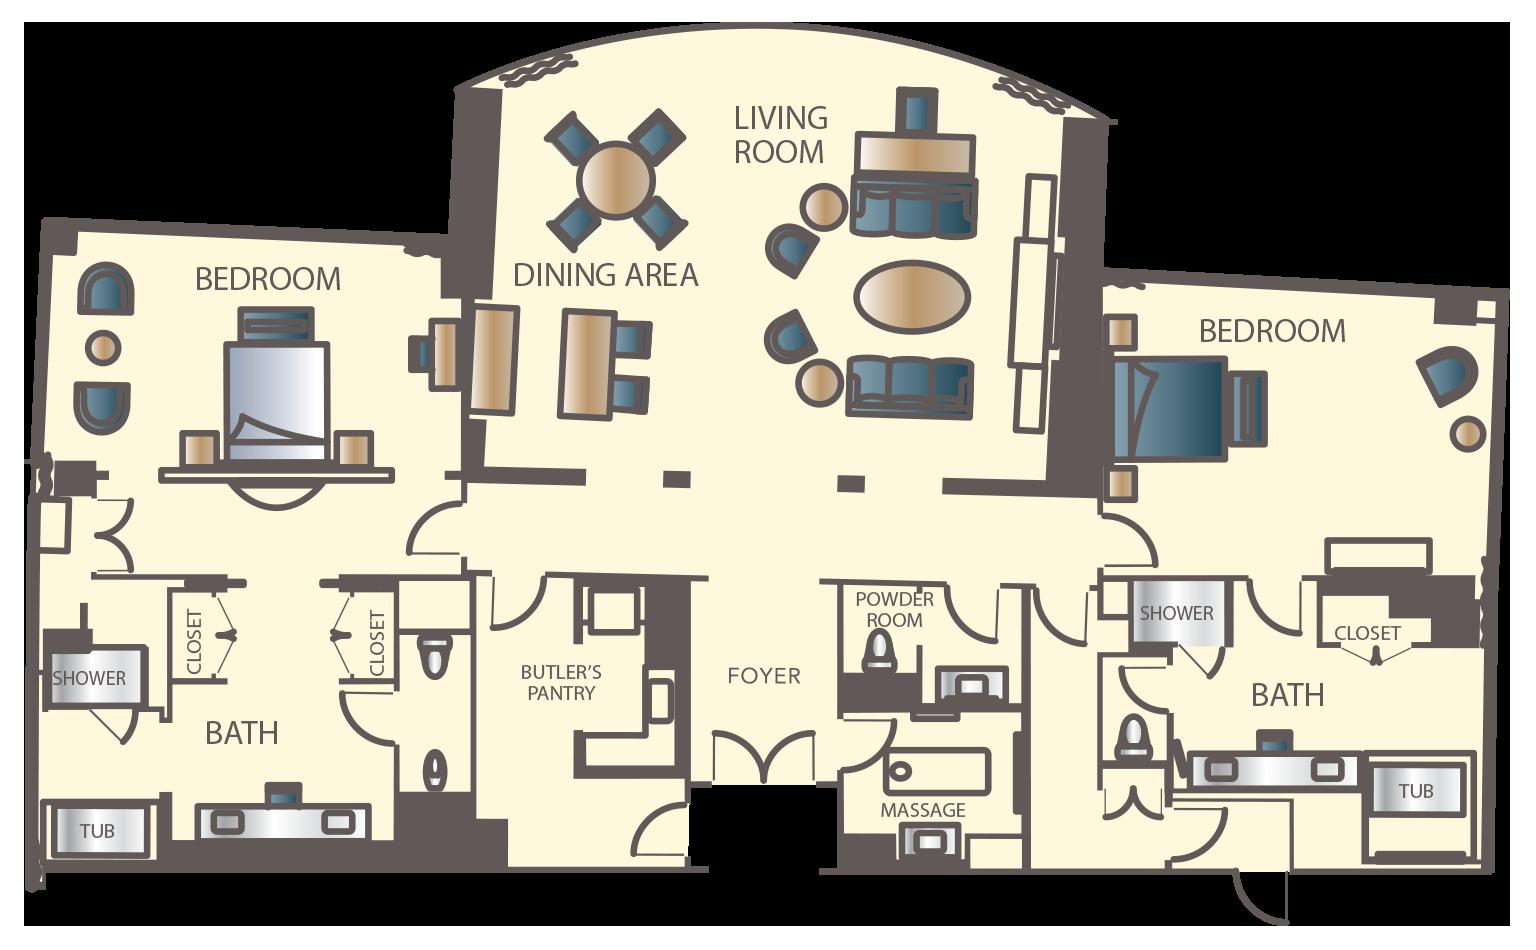 Encore Two Bedroom Apartment Floorplan Two Bedroom Apartments Las Vegas Resorts Hotels Room